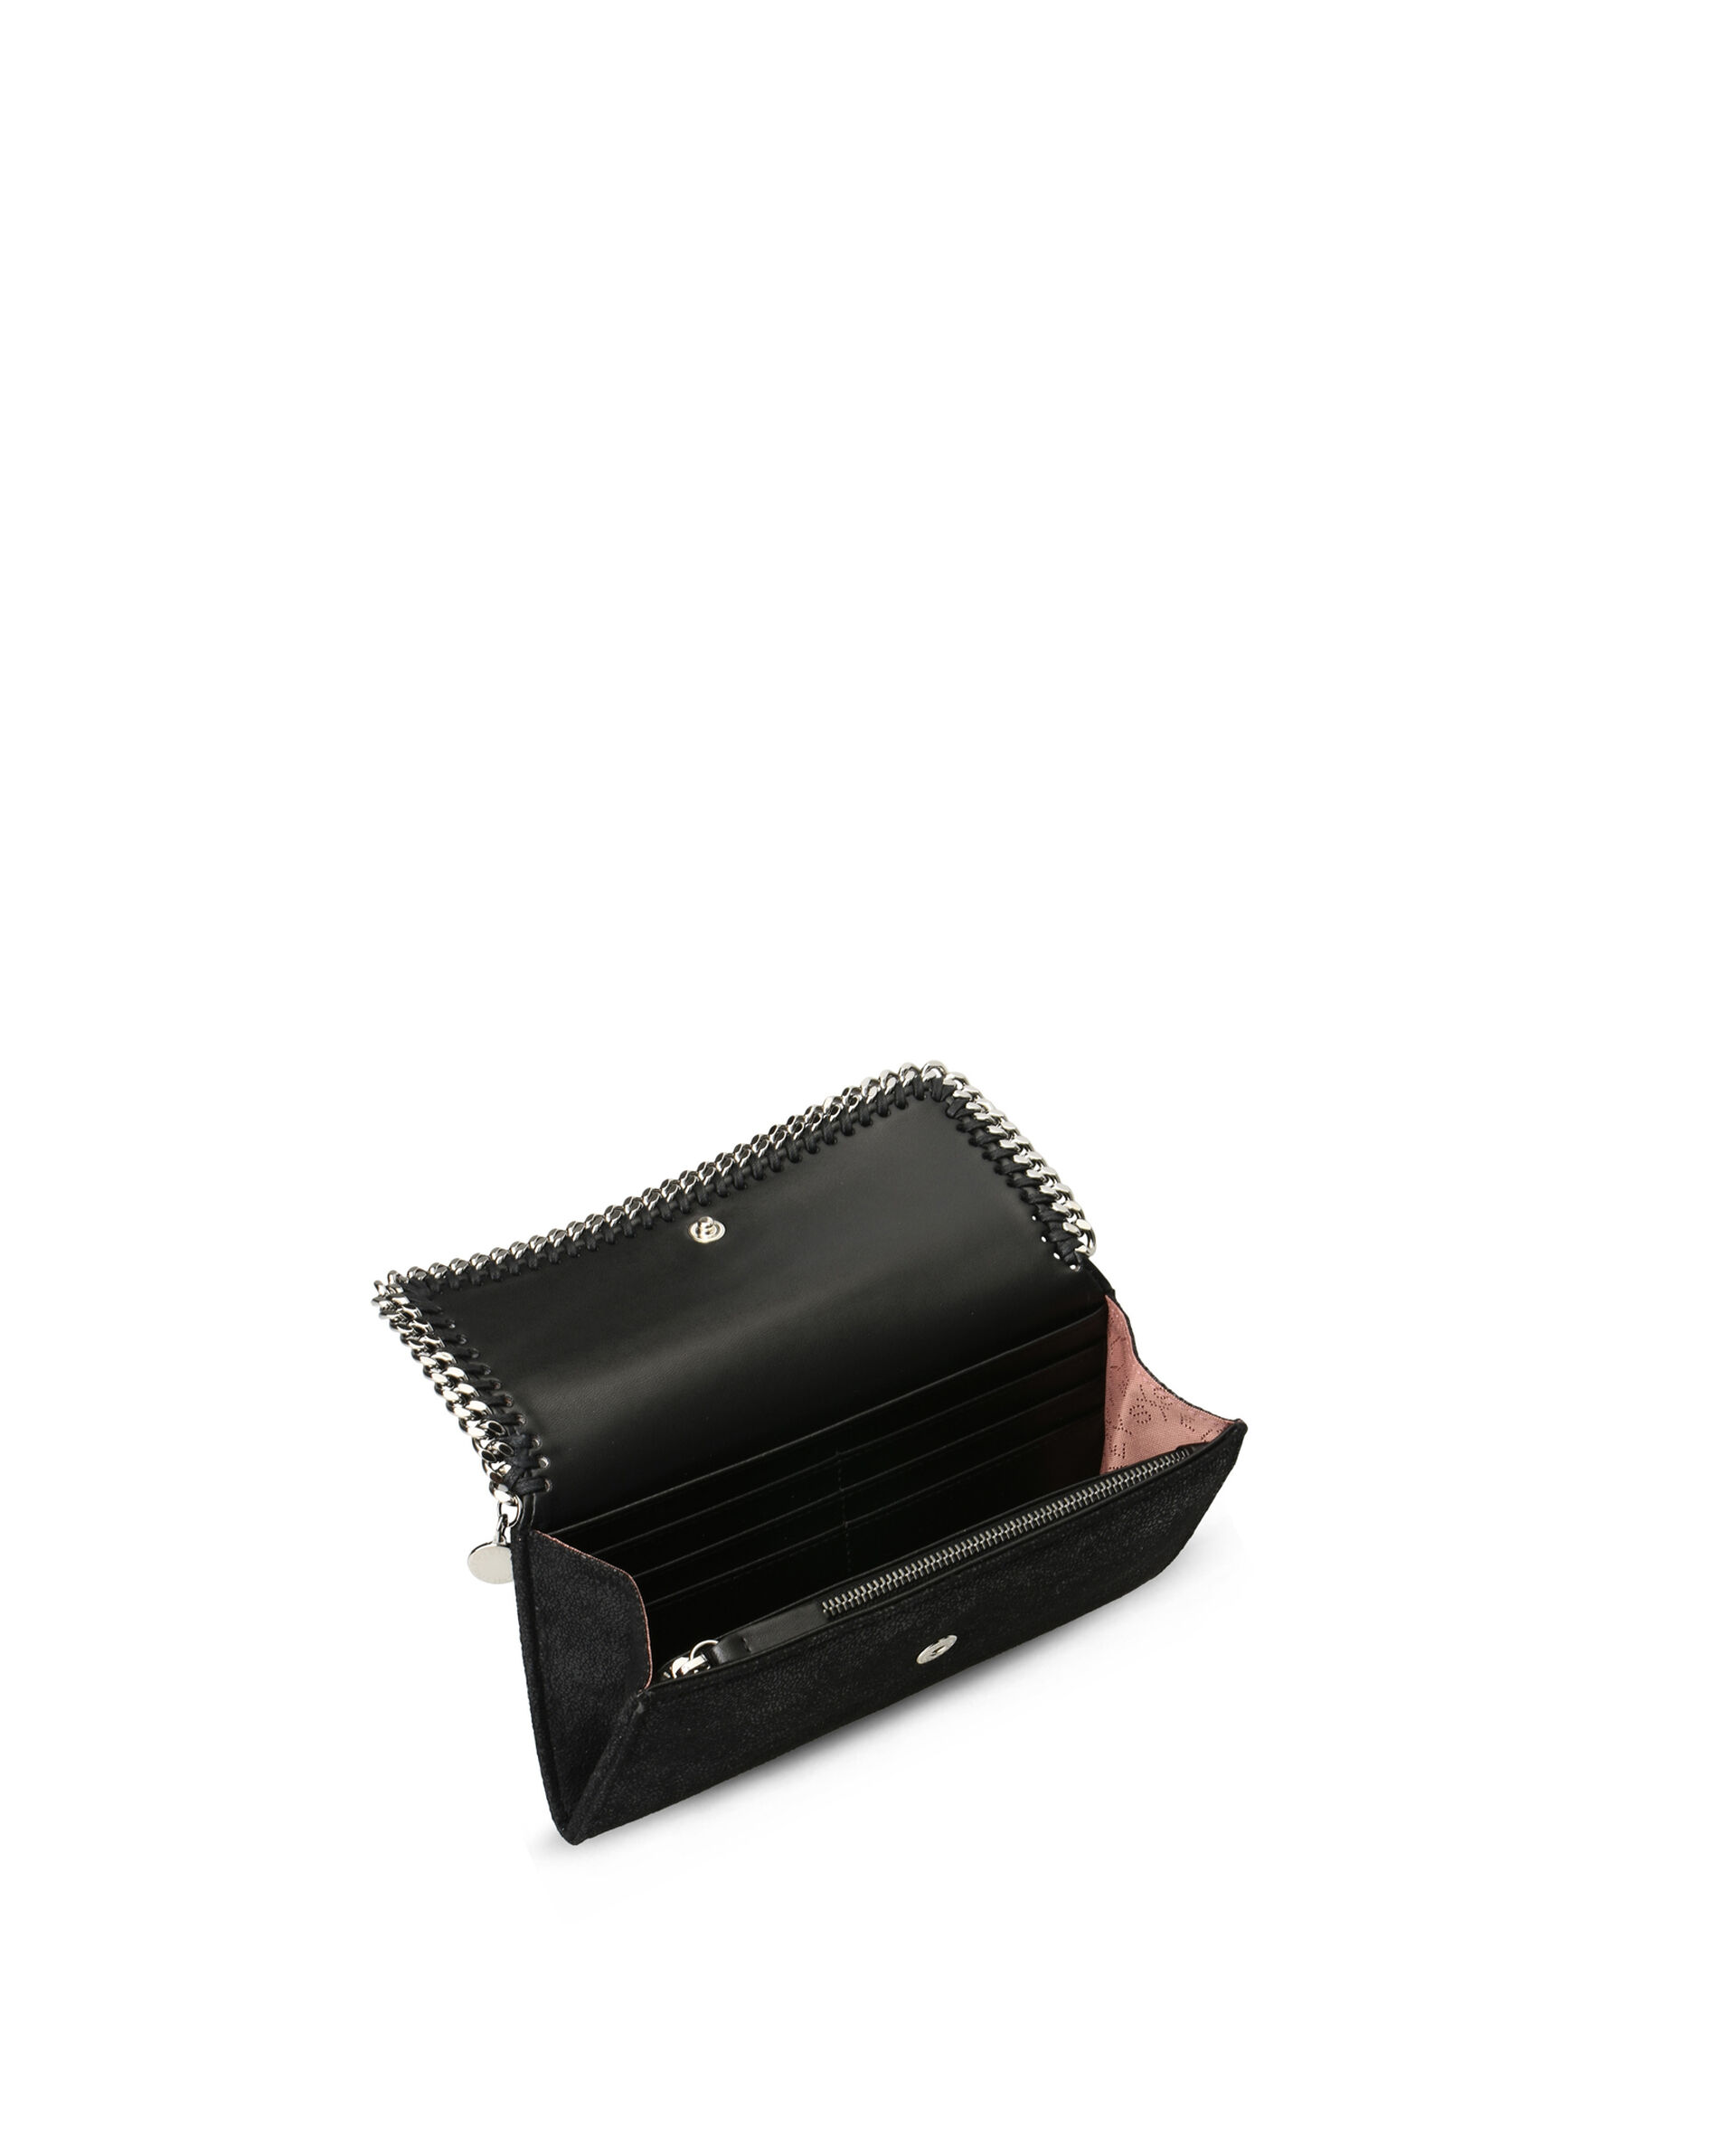 Kontinentale Brieftasche Falabella-Grau-large image number 2